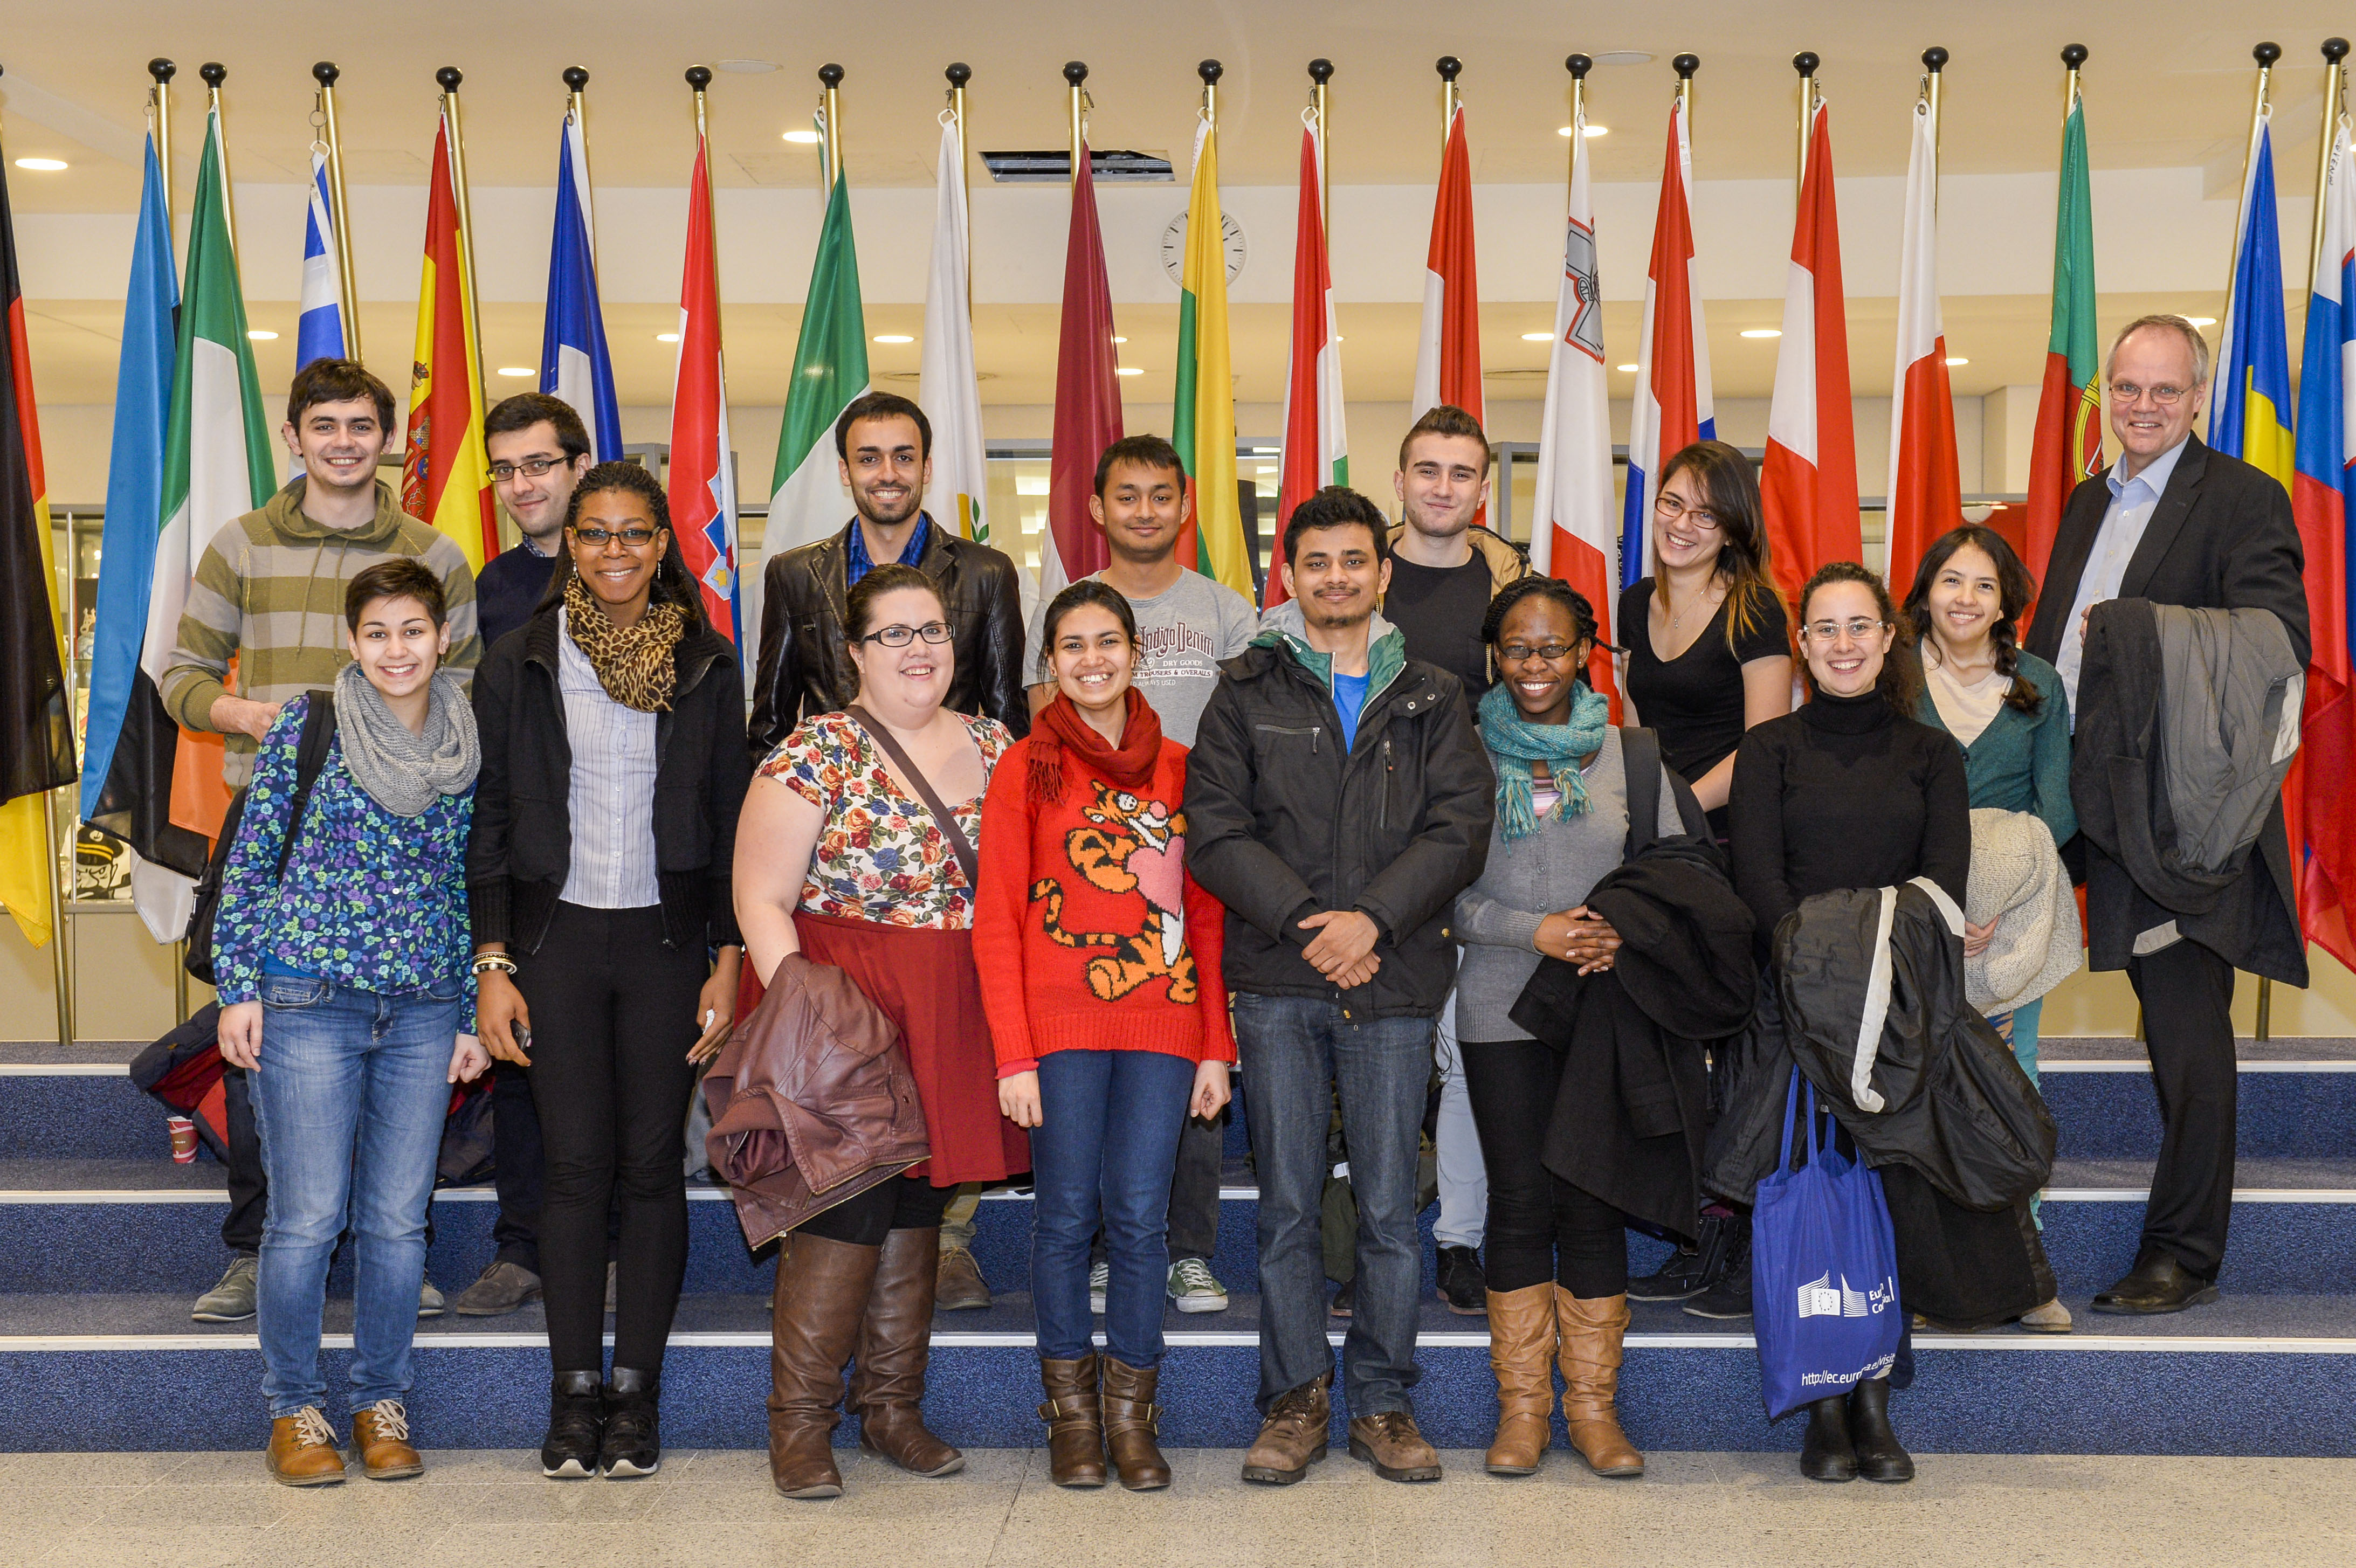 Jacobs University at European Parliament 2014